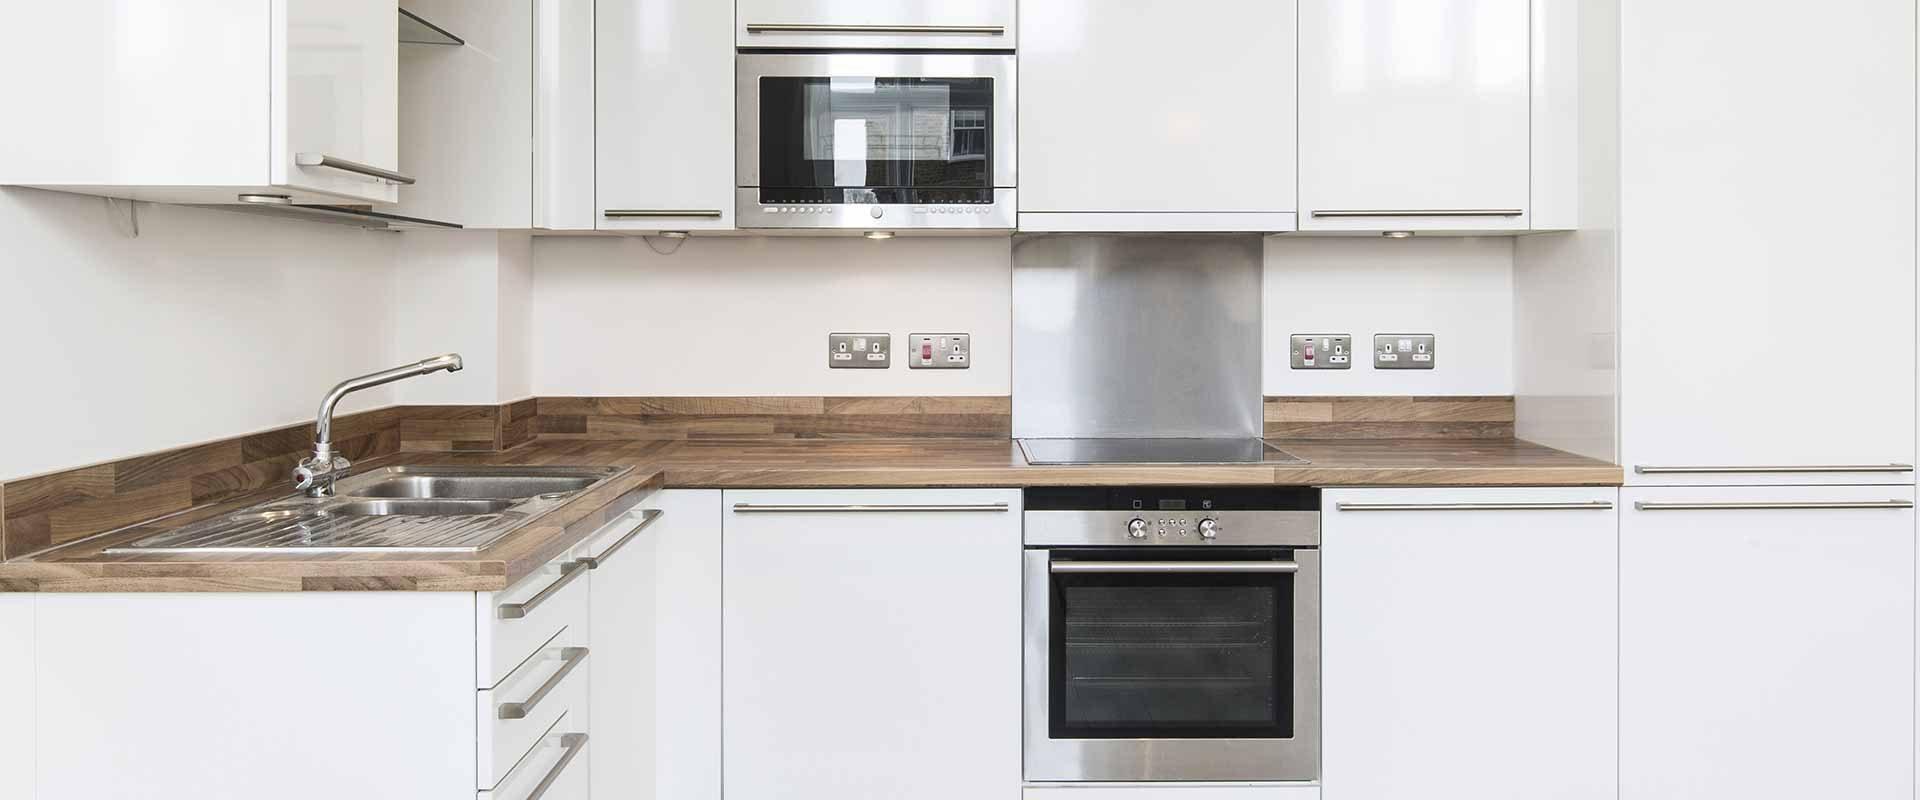 Elkington kitchens Solihull